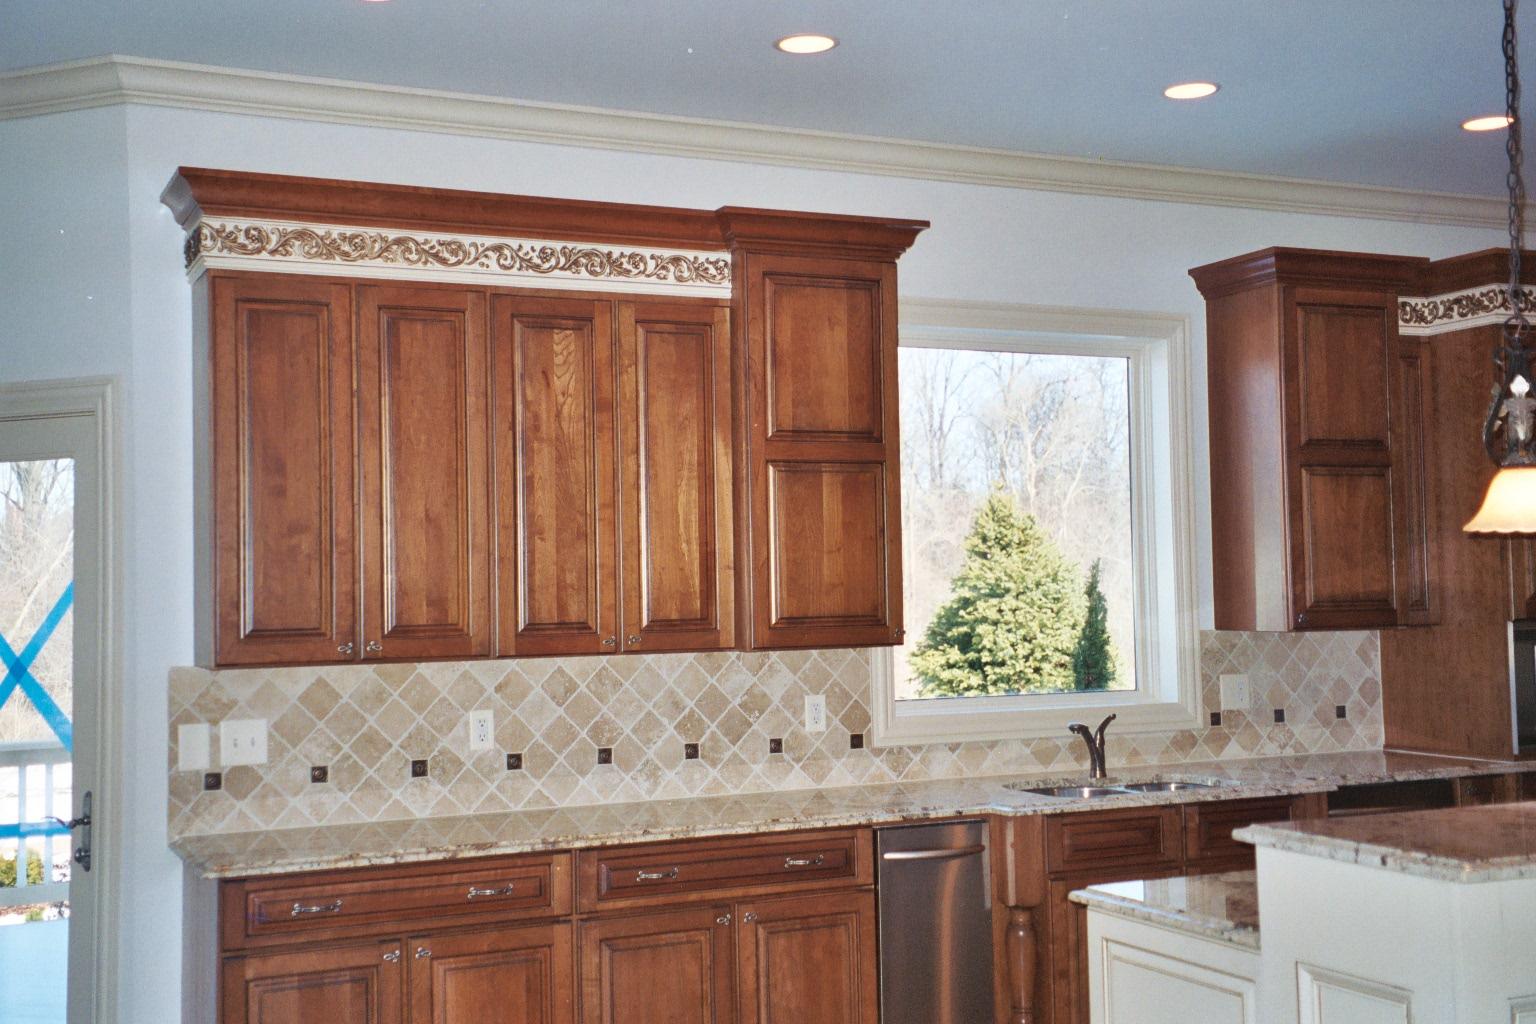 - Natural Stone Backsplash Tile Stone Wall Tiles Belk Tile